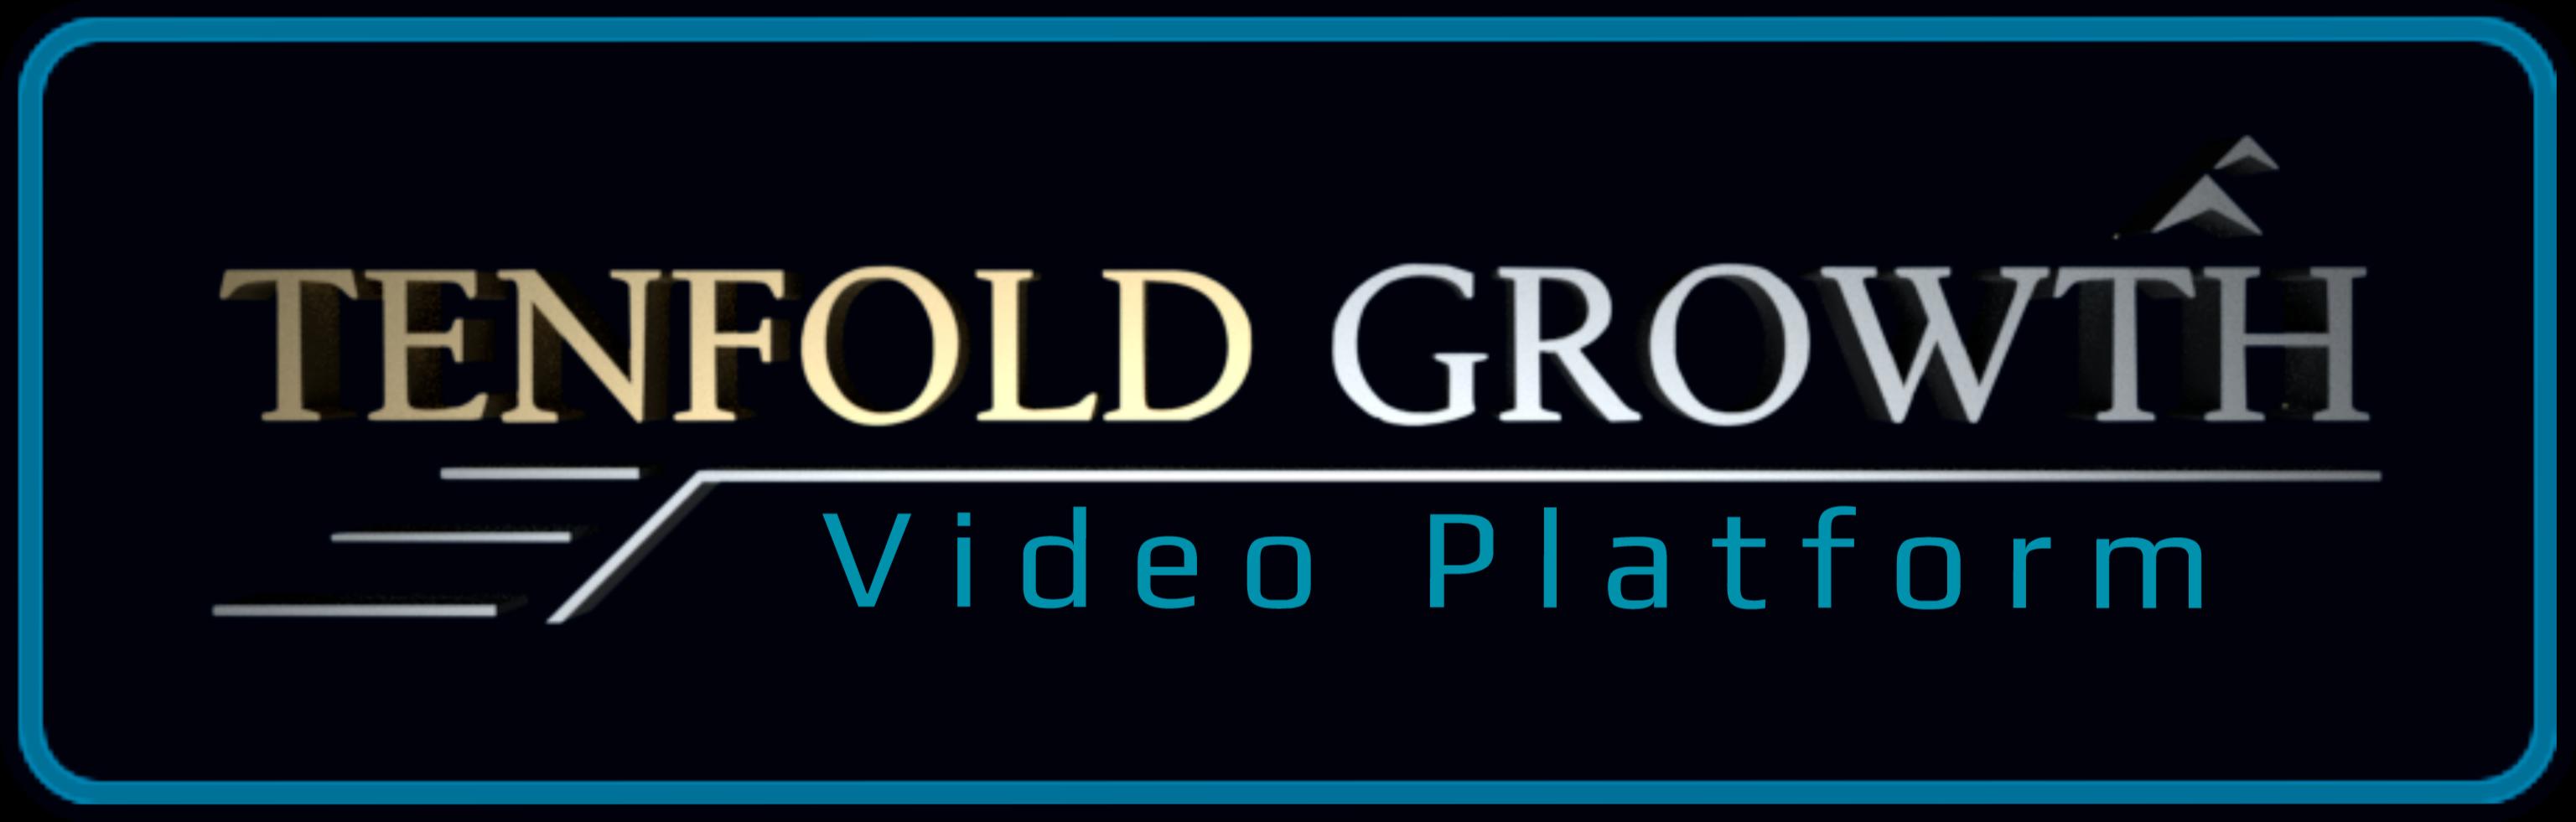 Tenfold Growth - Video Platform